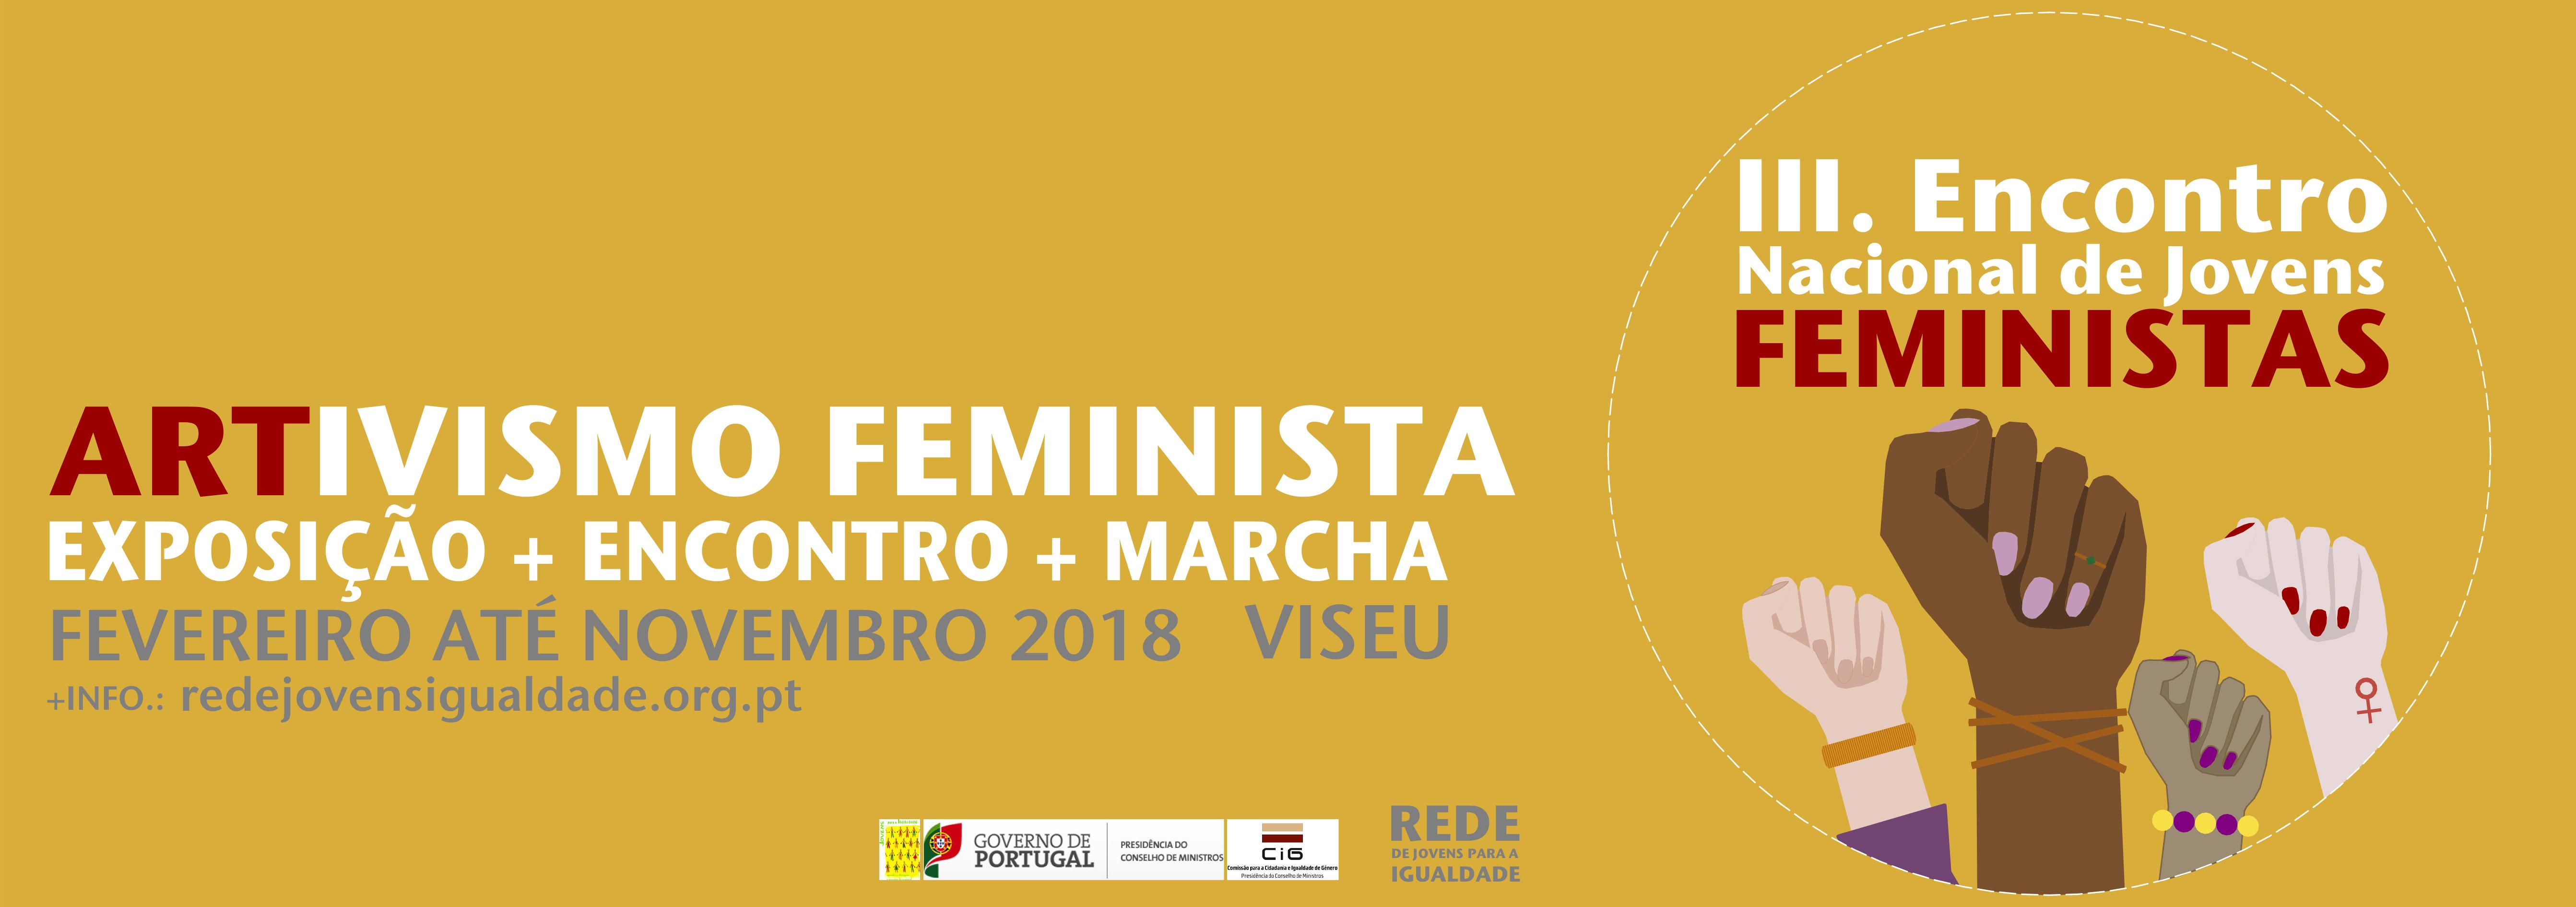 III. Encontro Nacional de Jovens Feministas